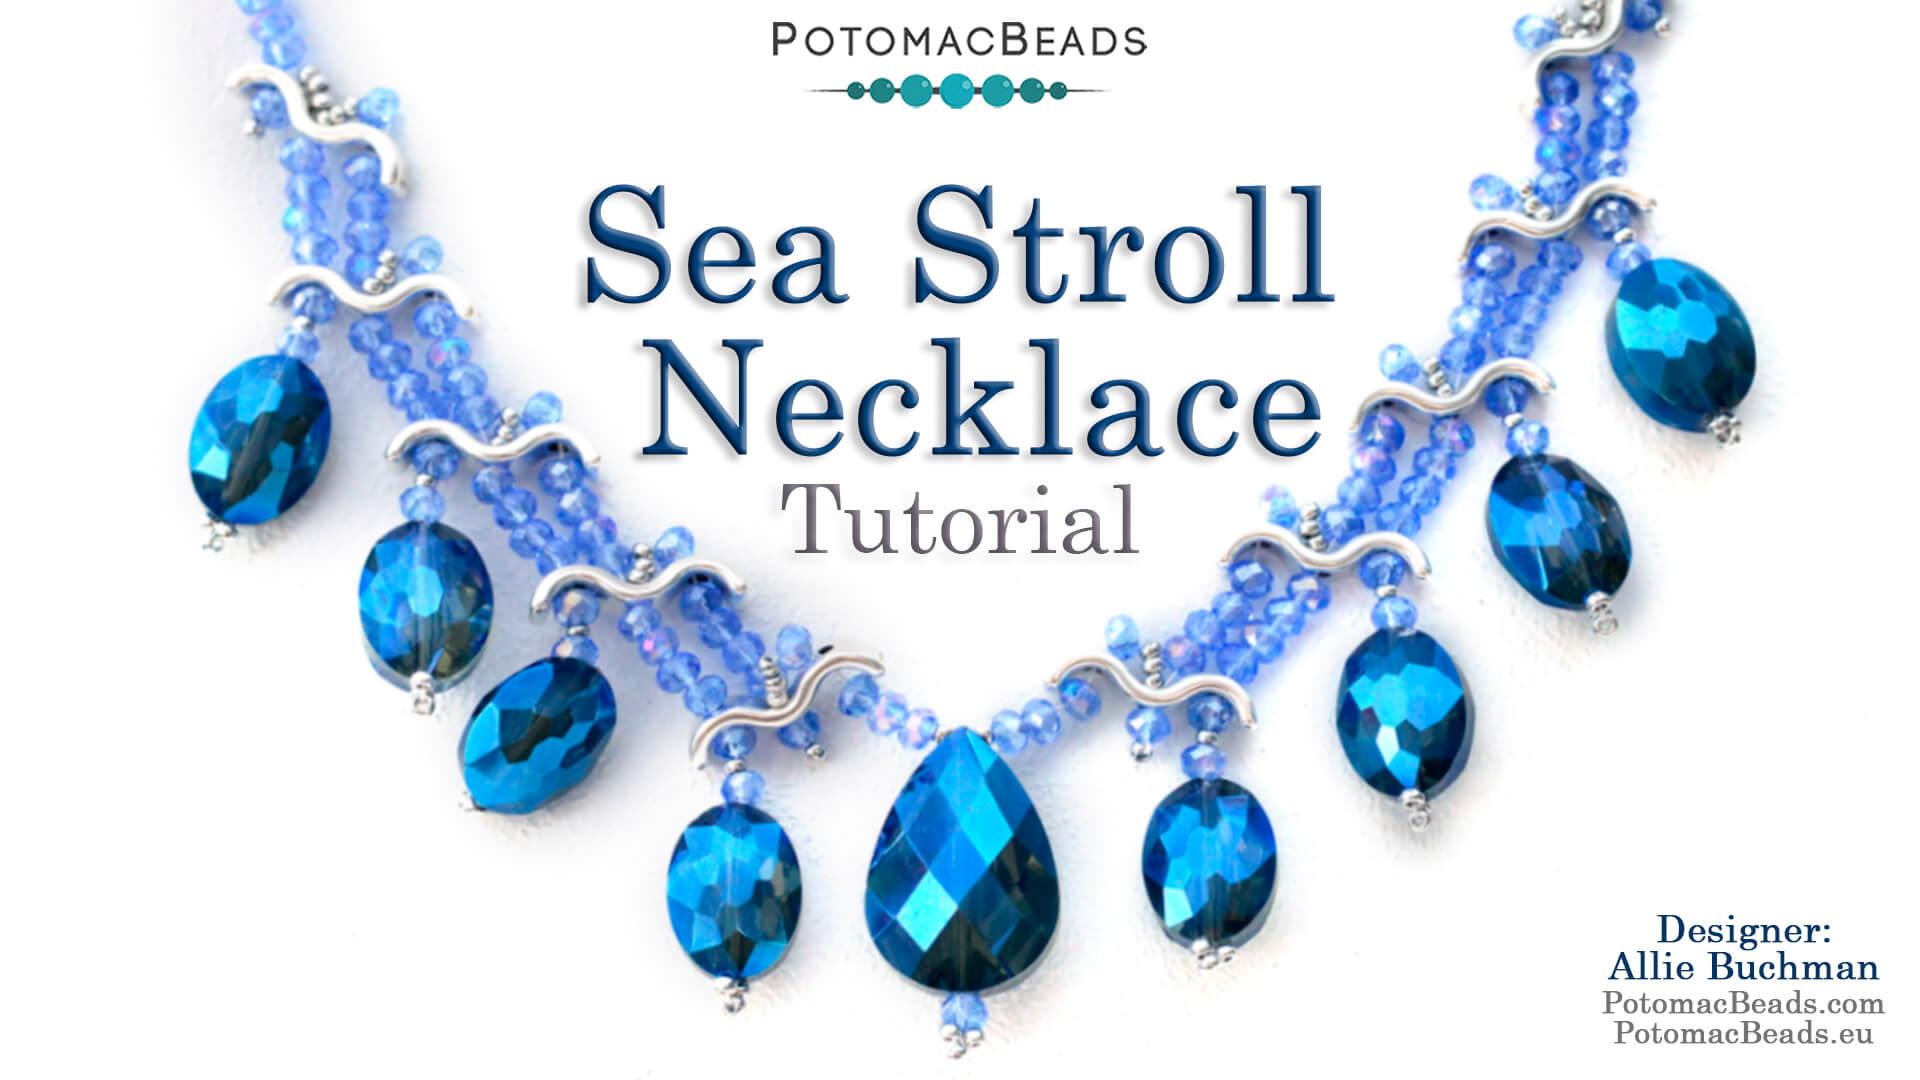 How to Bead Jewelry / Beading Tutorials & Jewel Making Videos / Bead Weaving Tutorials & Necklace Tutorial / Sea Stroll Necklace Tutorial